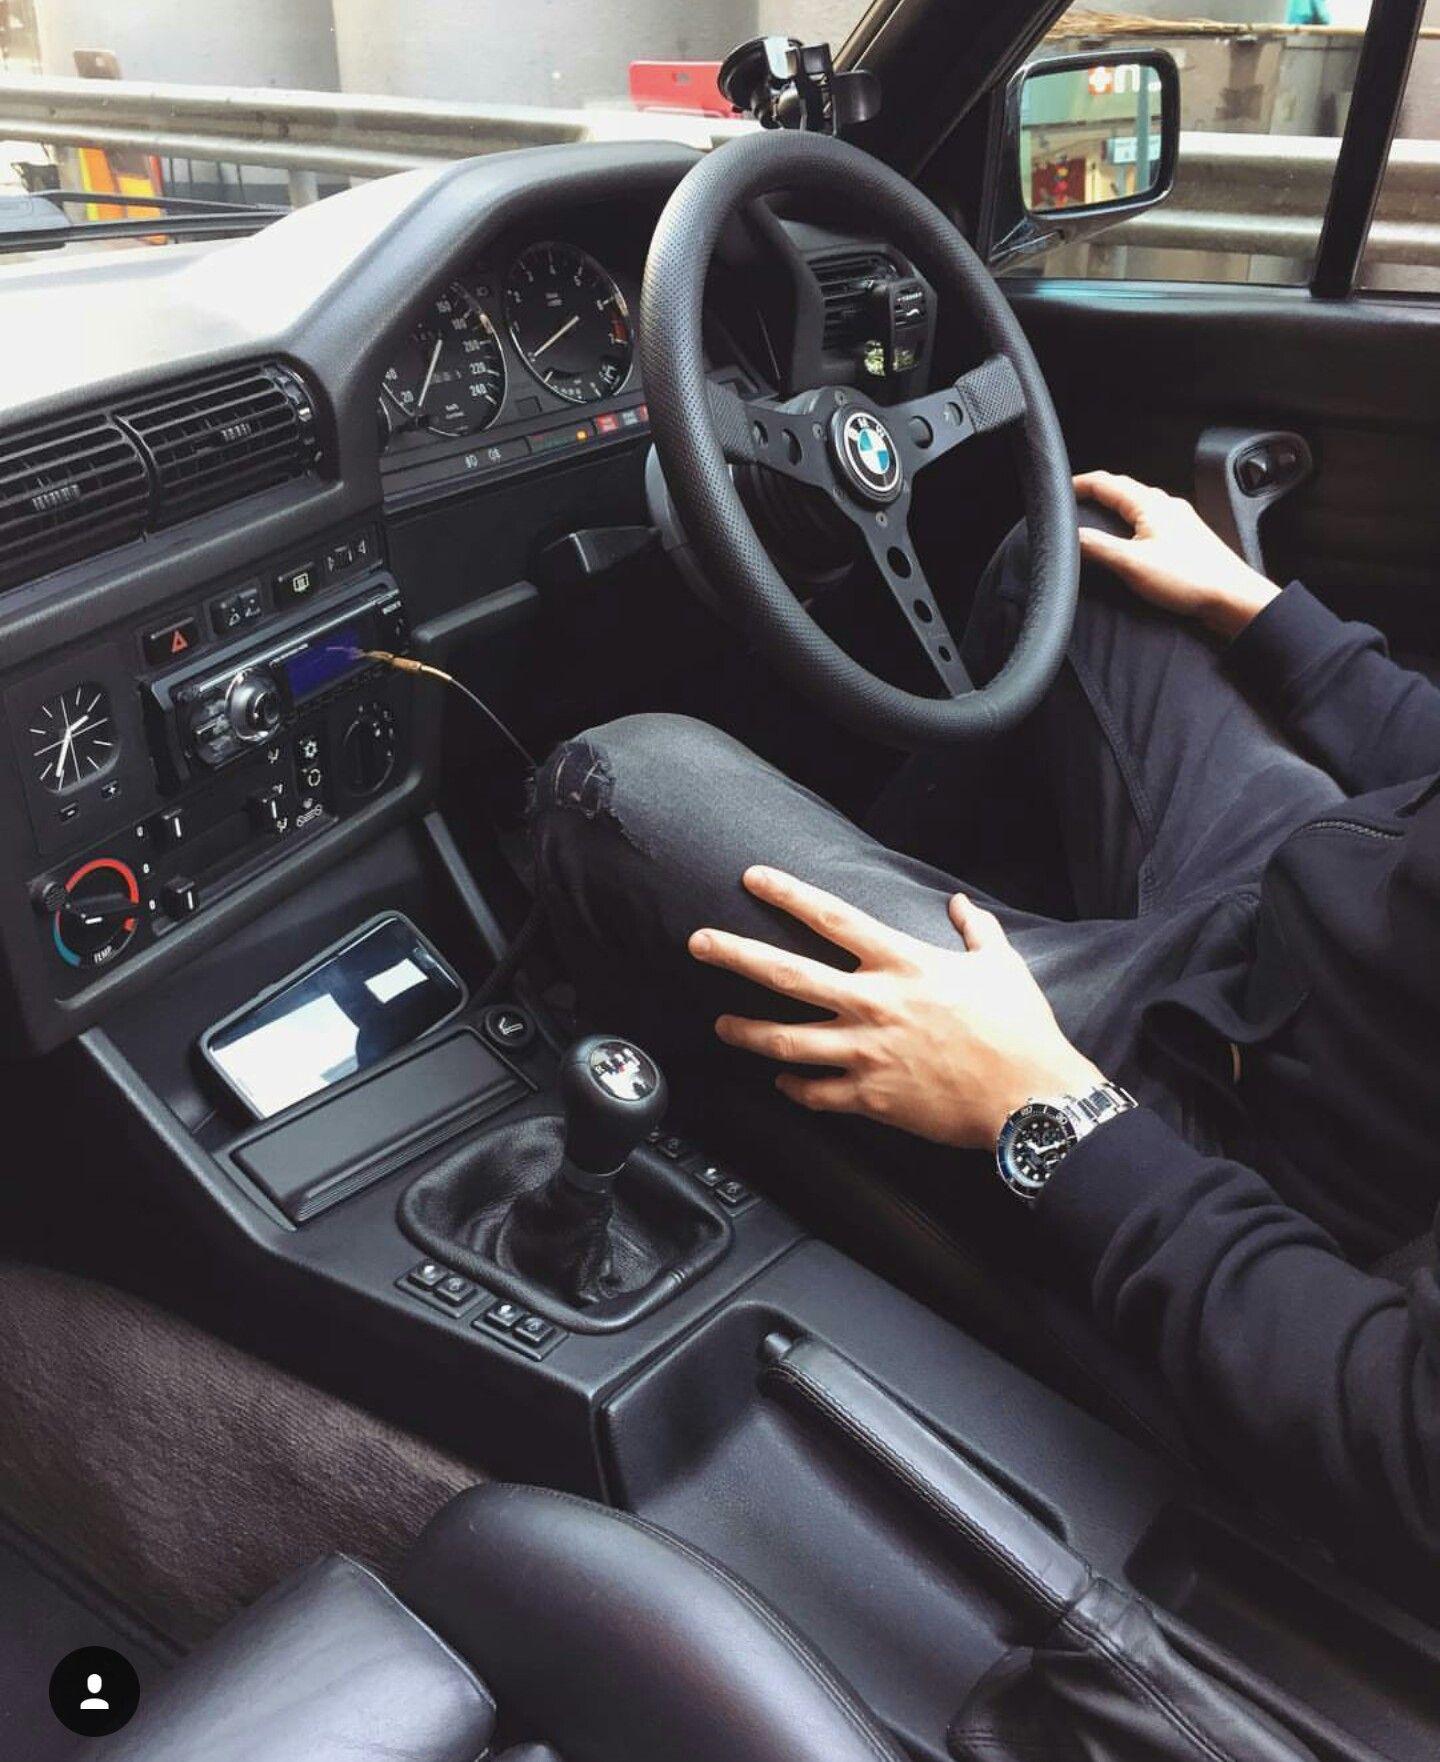 Bmw M3 Interior: Carros, Automobilismo, Vida De Luxo